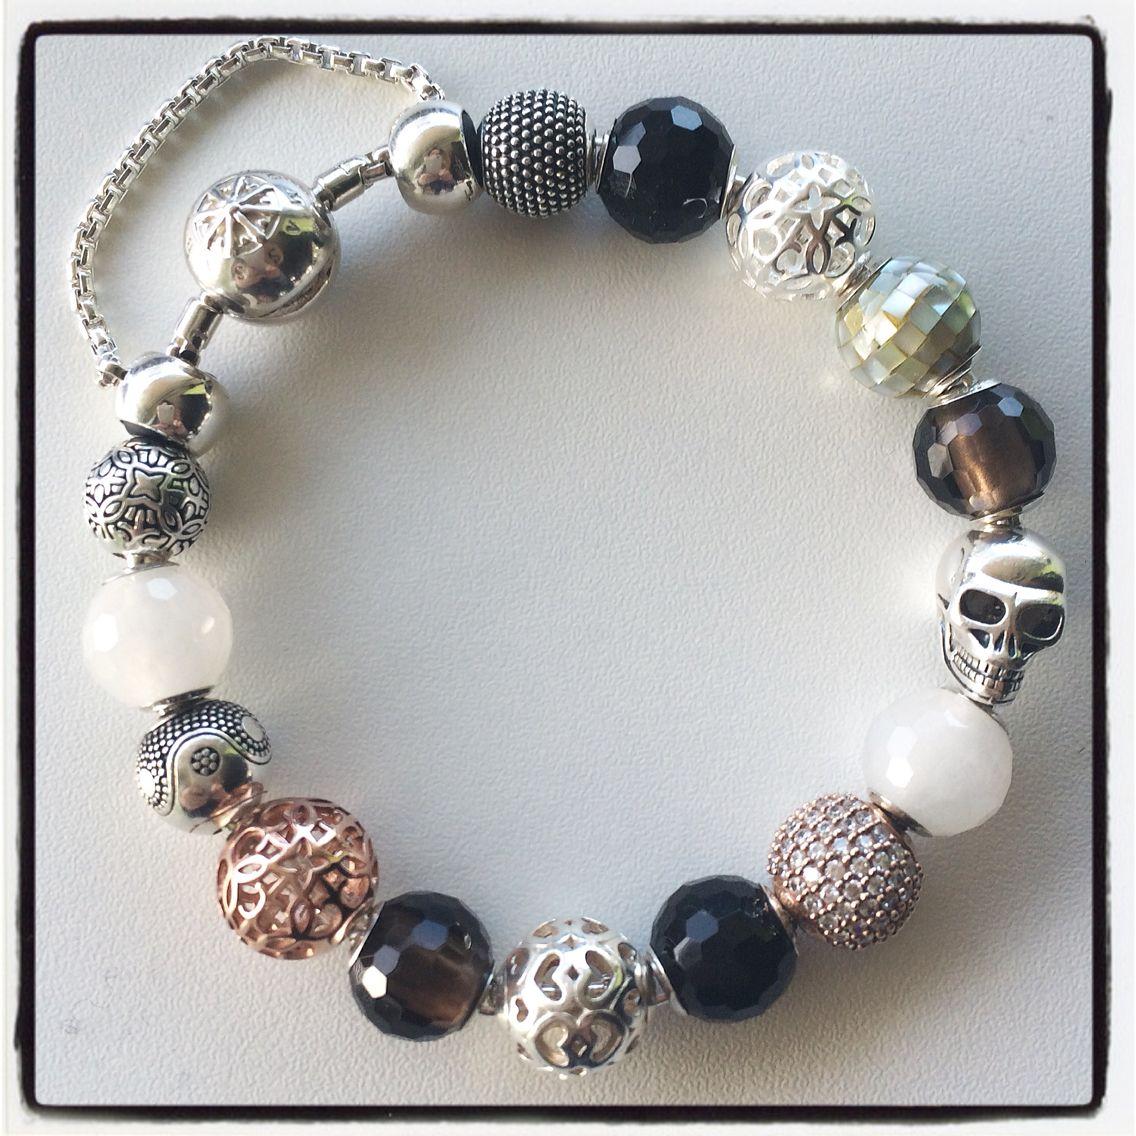 Added A Few New Thomas Sabo Karma Beads To My Bracelet #thomassabo  #thomassabokarmabeads